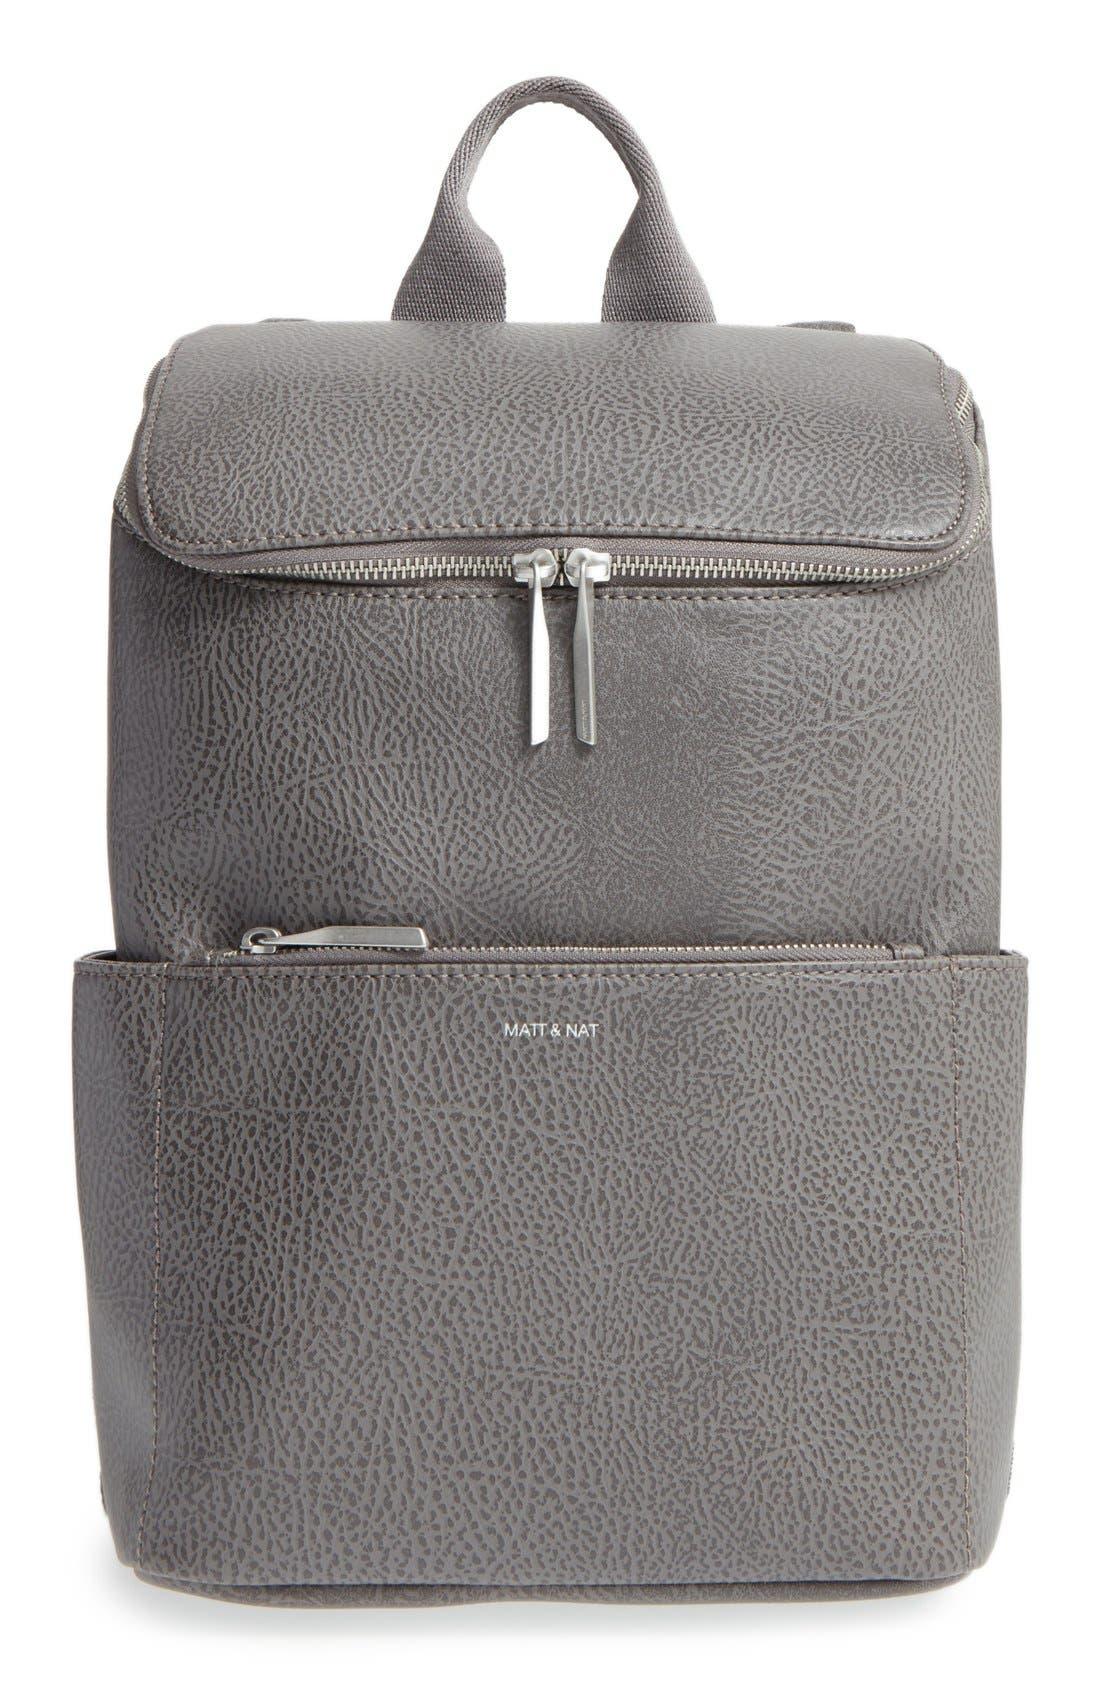 Main Image - Matt & Nat 'Brave' Faux Leather Backpack